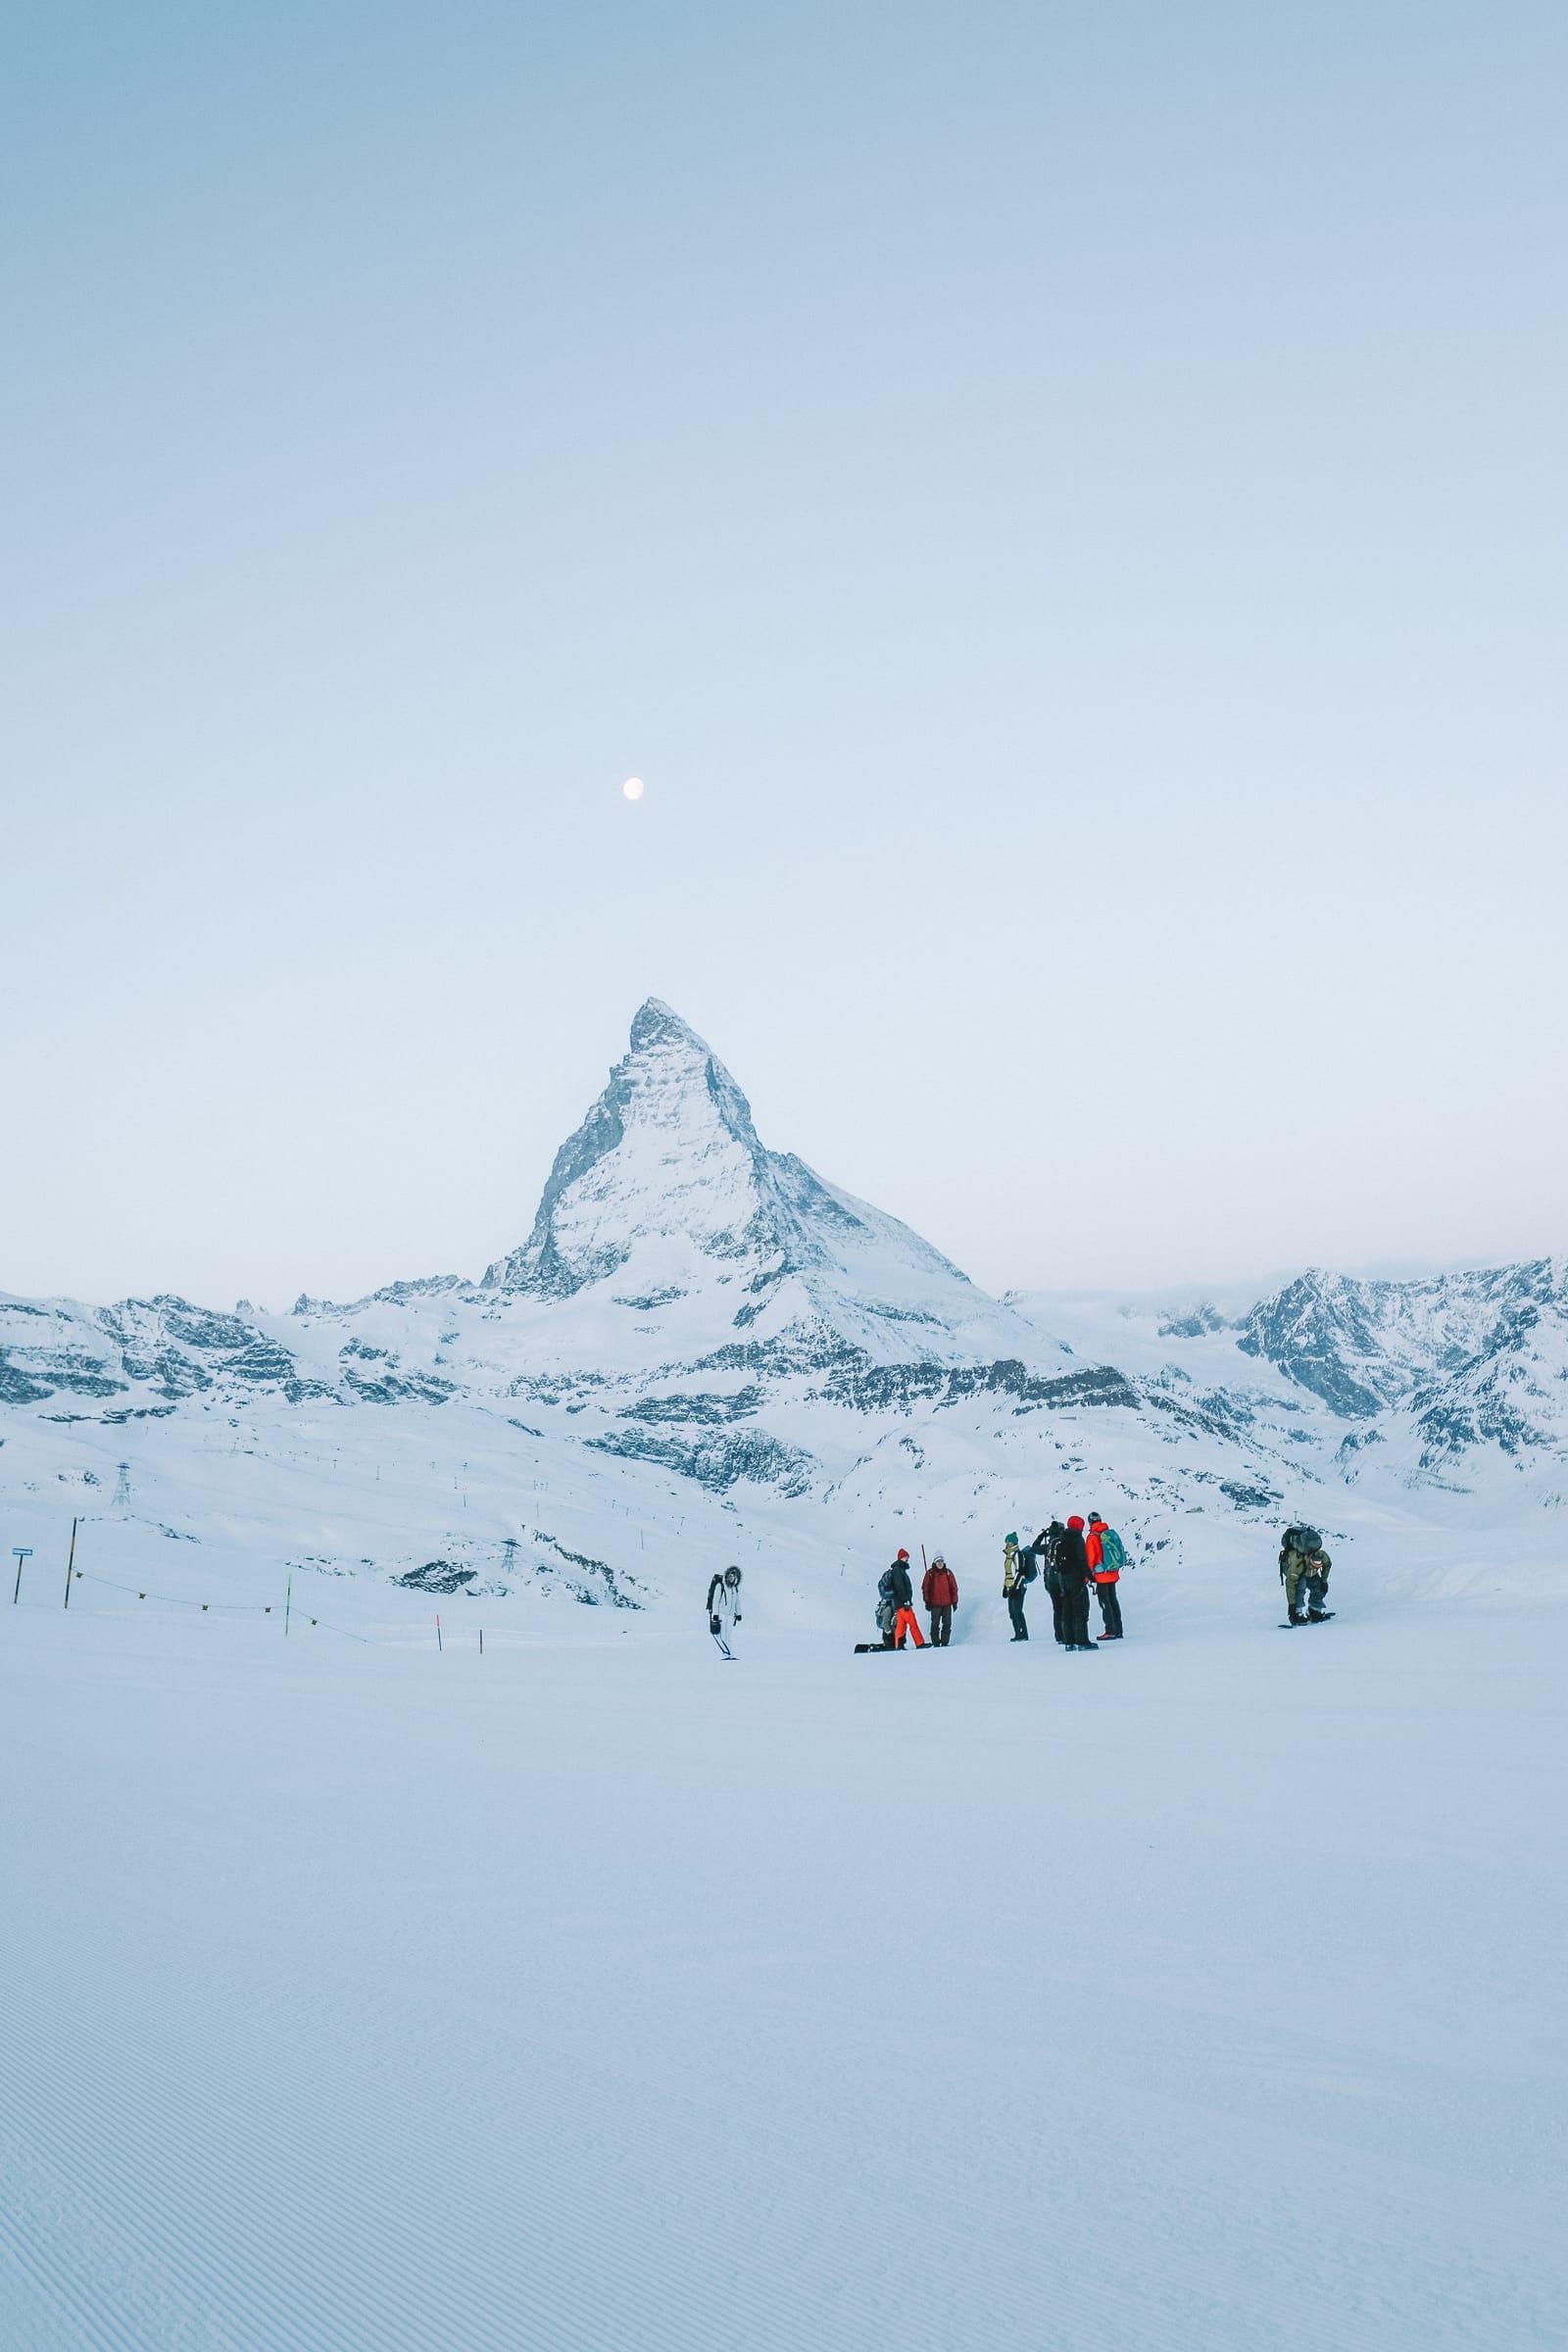 Sleeping In An Igloo Under The Matterhorn... In Zermatt, Switzerland (44)